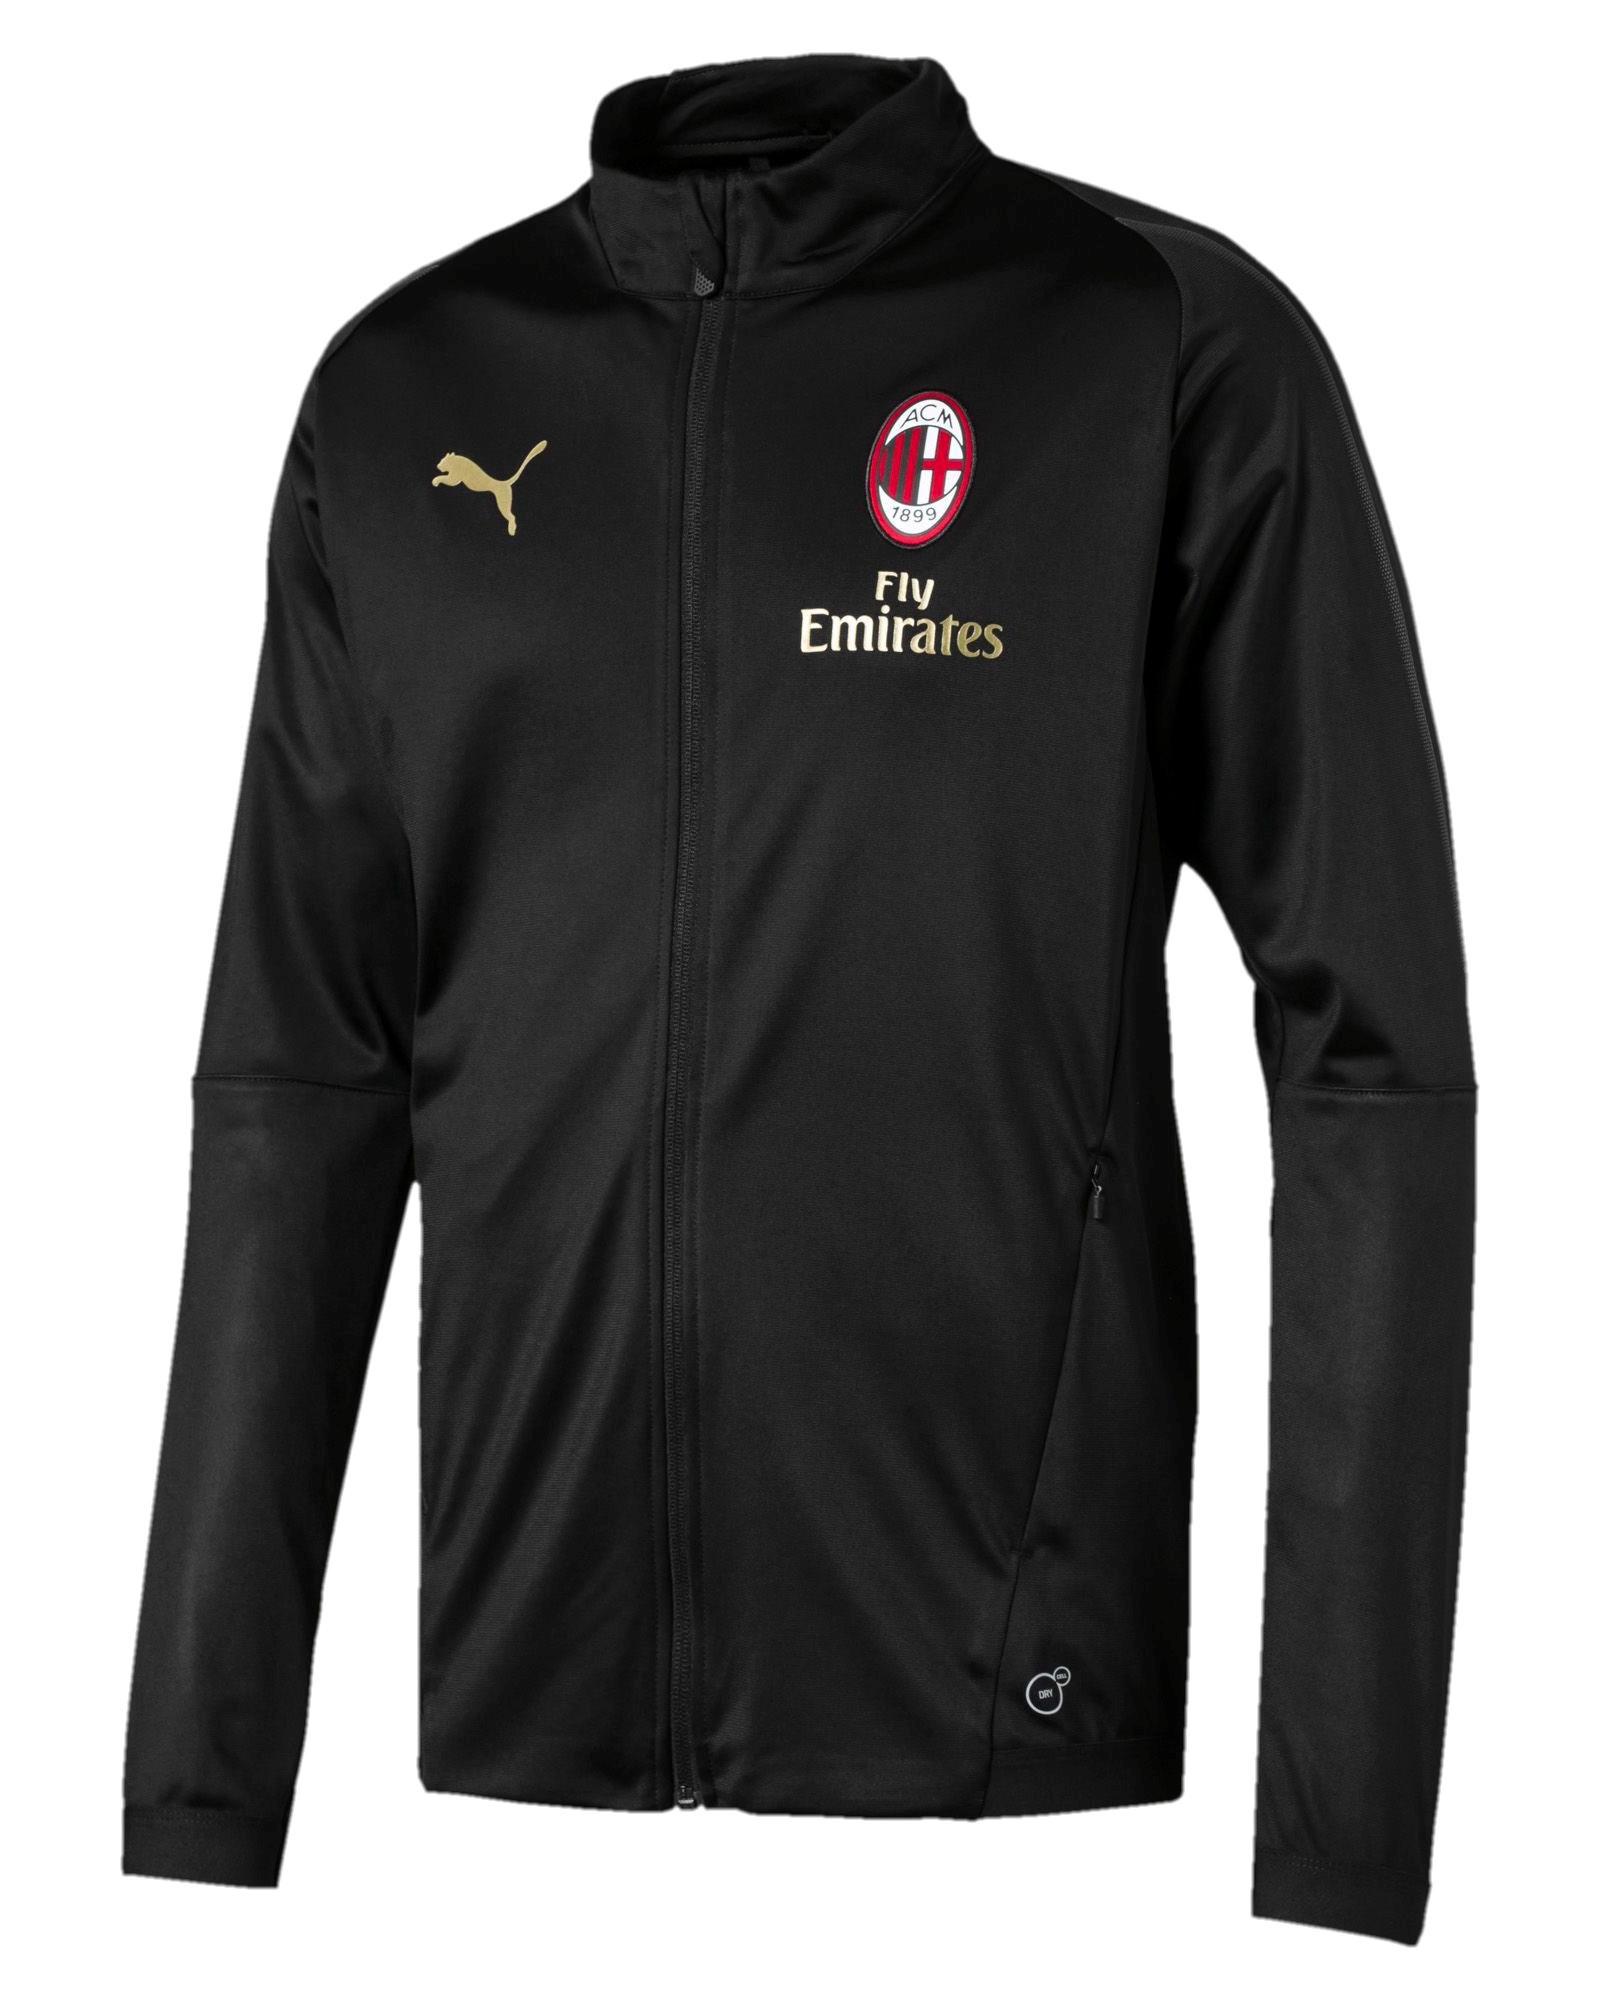 33bfaa716 Ac Milan Puma Tuta Allenamento Tracksuit 2018 19 Nero Versione Panchina 4 4  di 8 ...